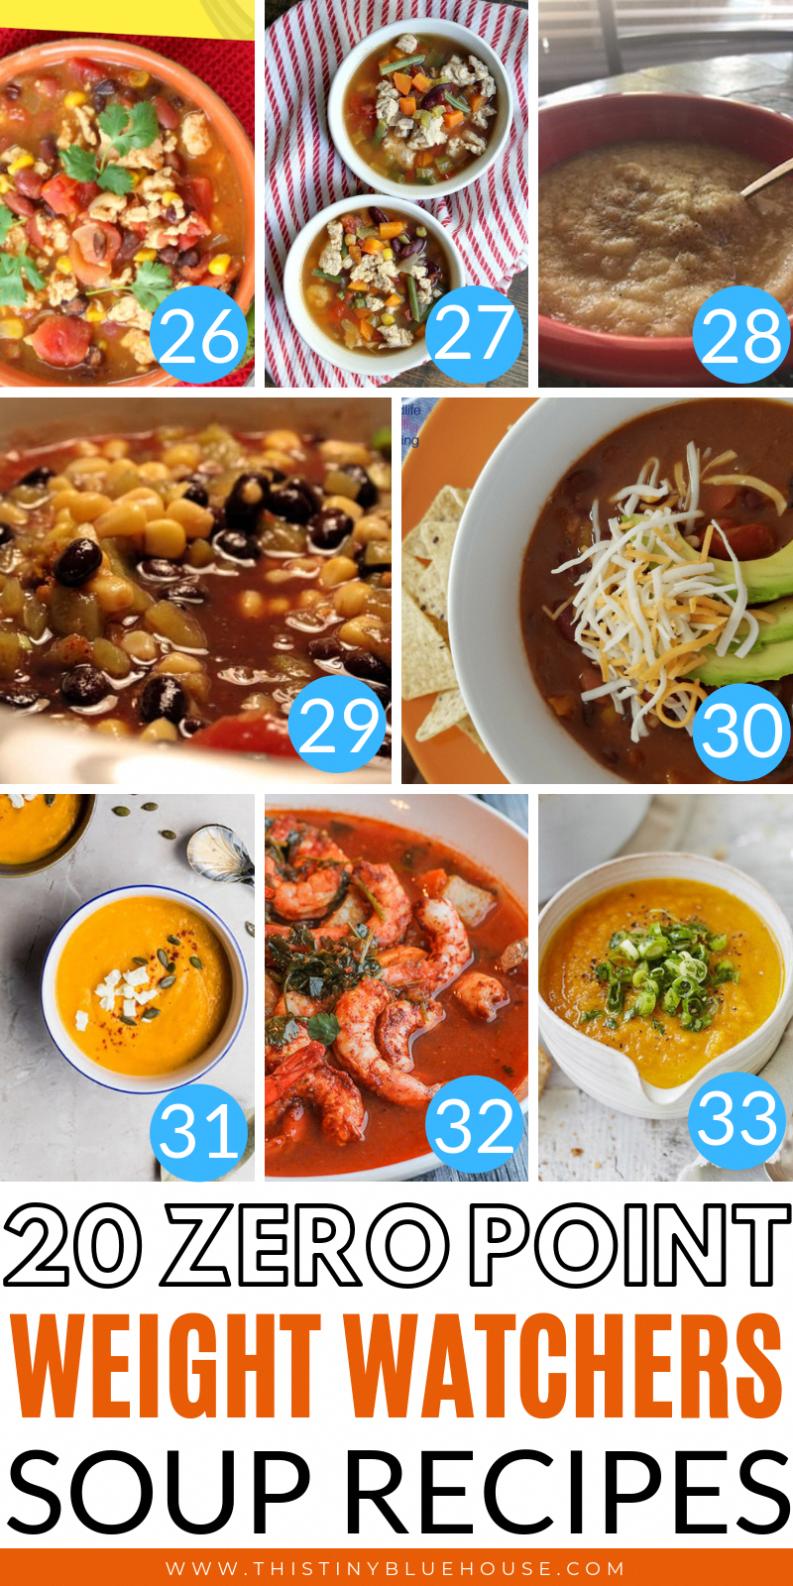 Pin By P Keller On Ligte En Weight Watchers Resepte In 2020 Weight Watchers Soup Weight Watchers Meals Weight Watchers Soup Recipes